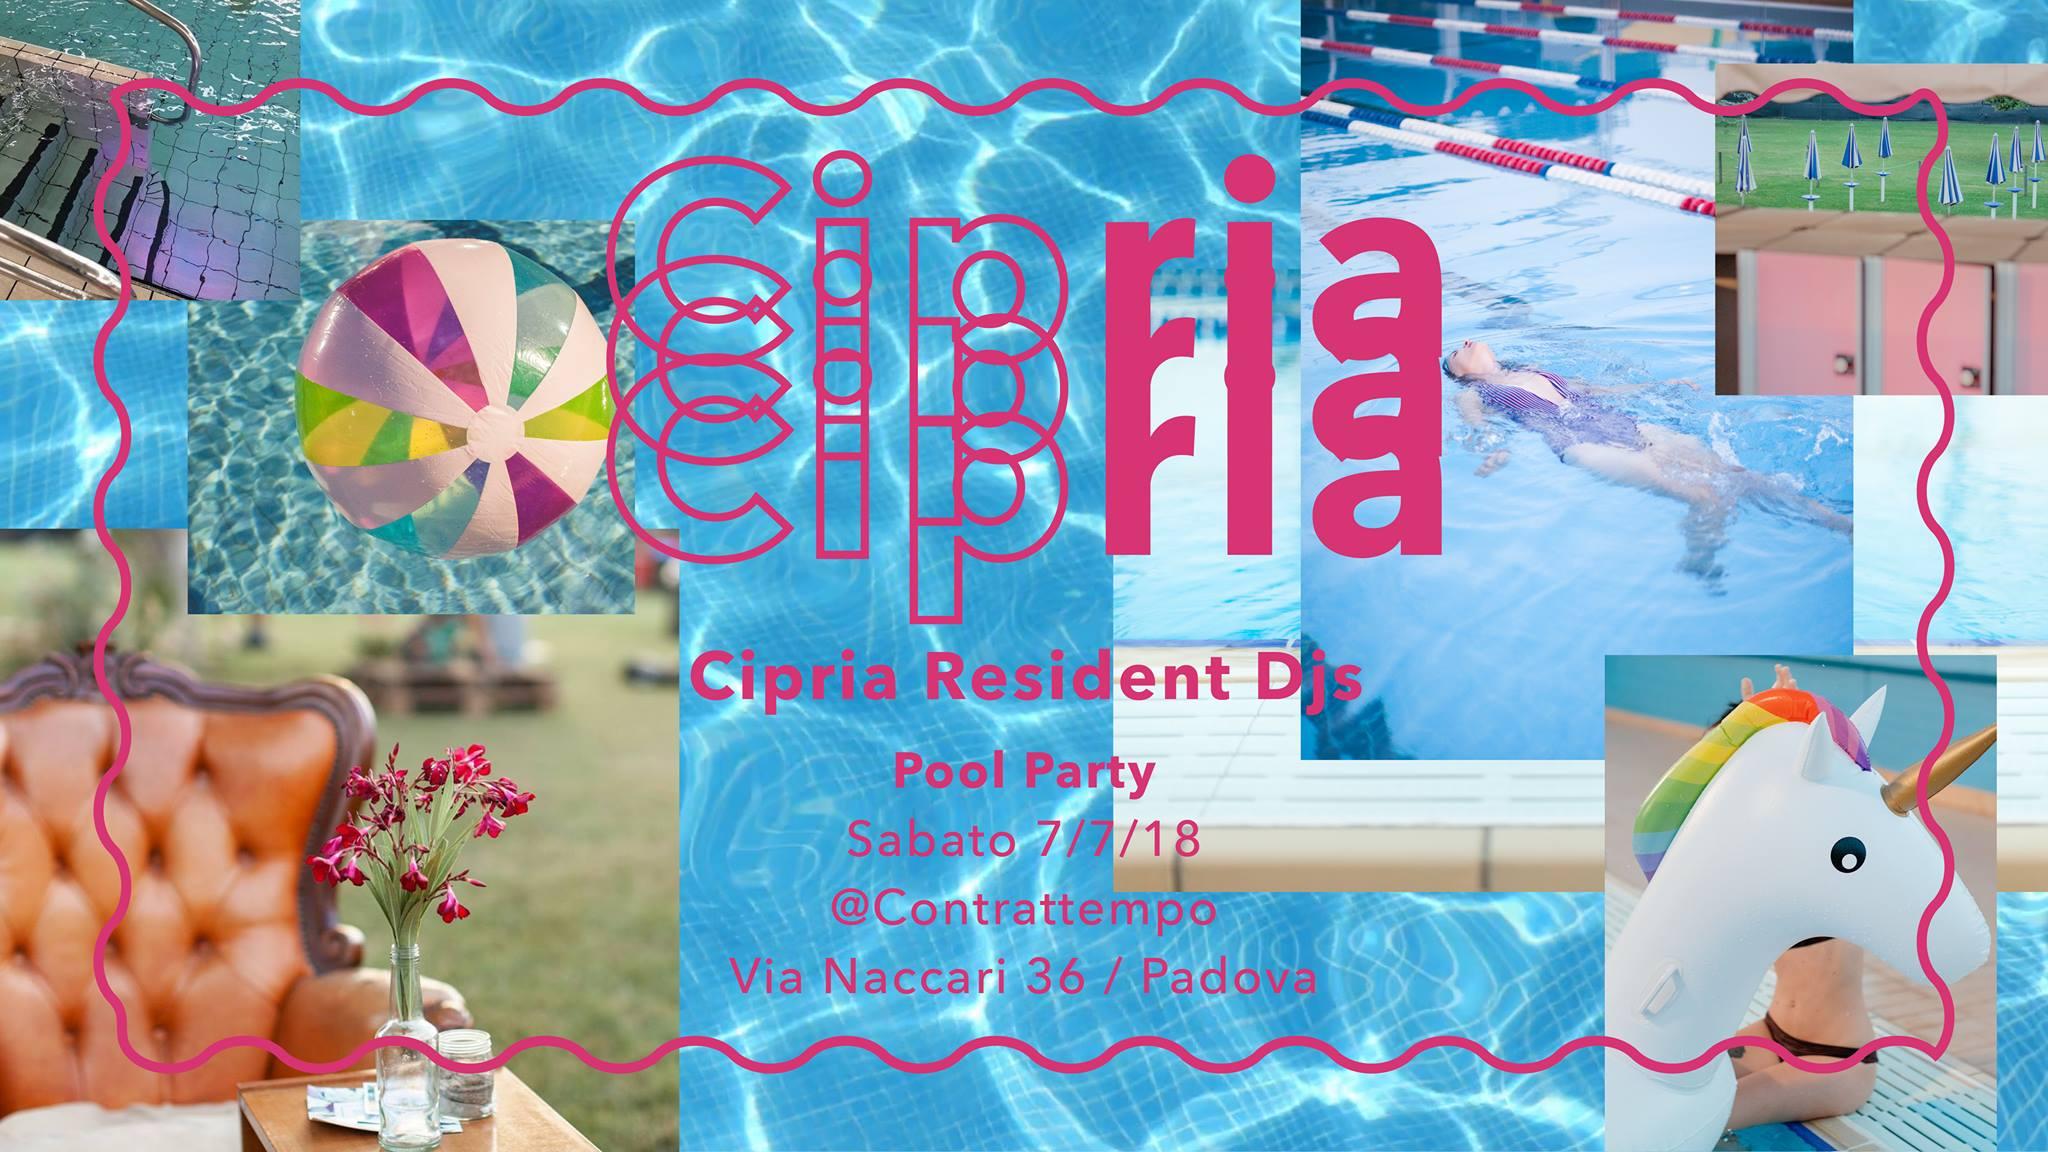 Cipria PoolParty@Contrattempo| Padova| Sab 07.07.18